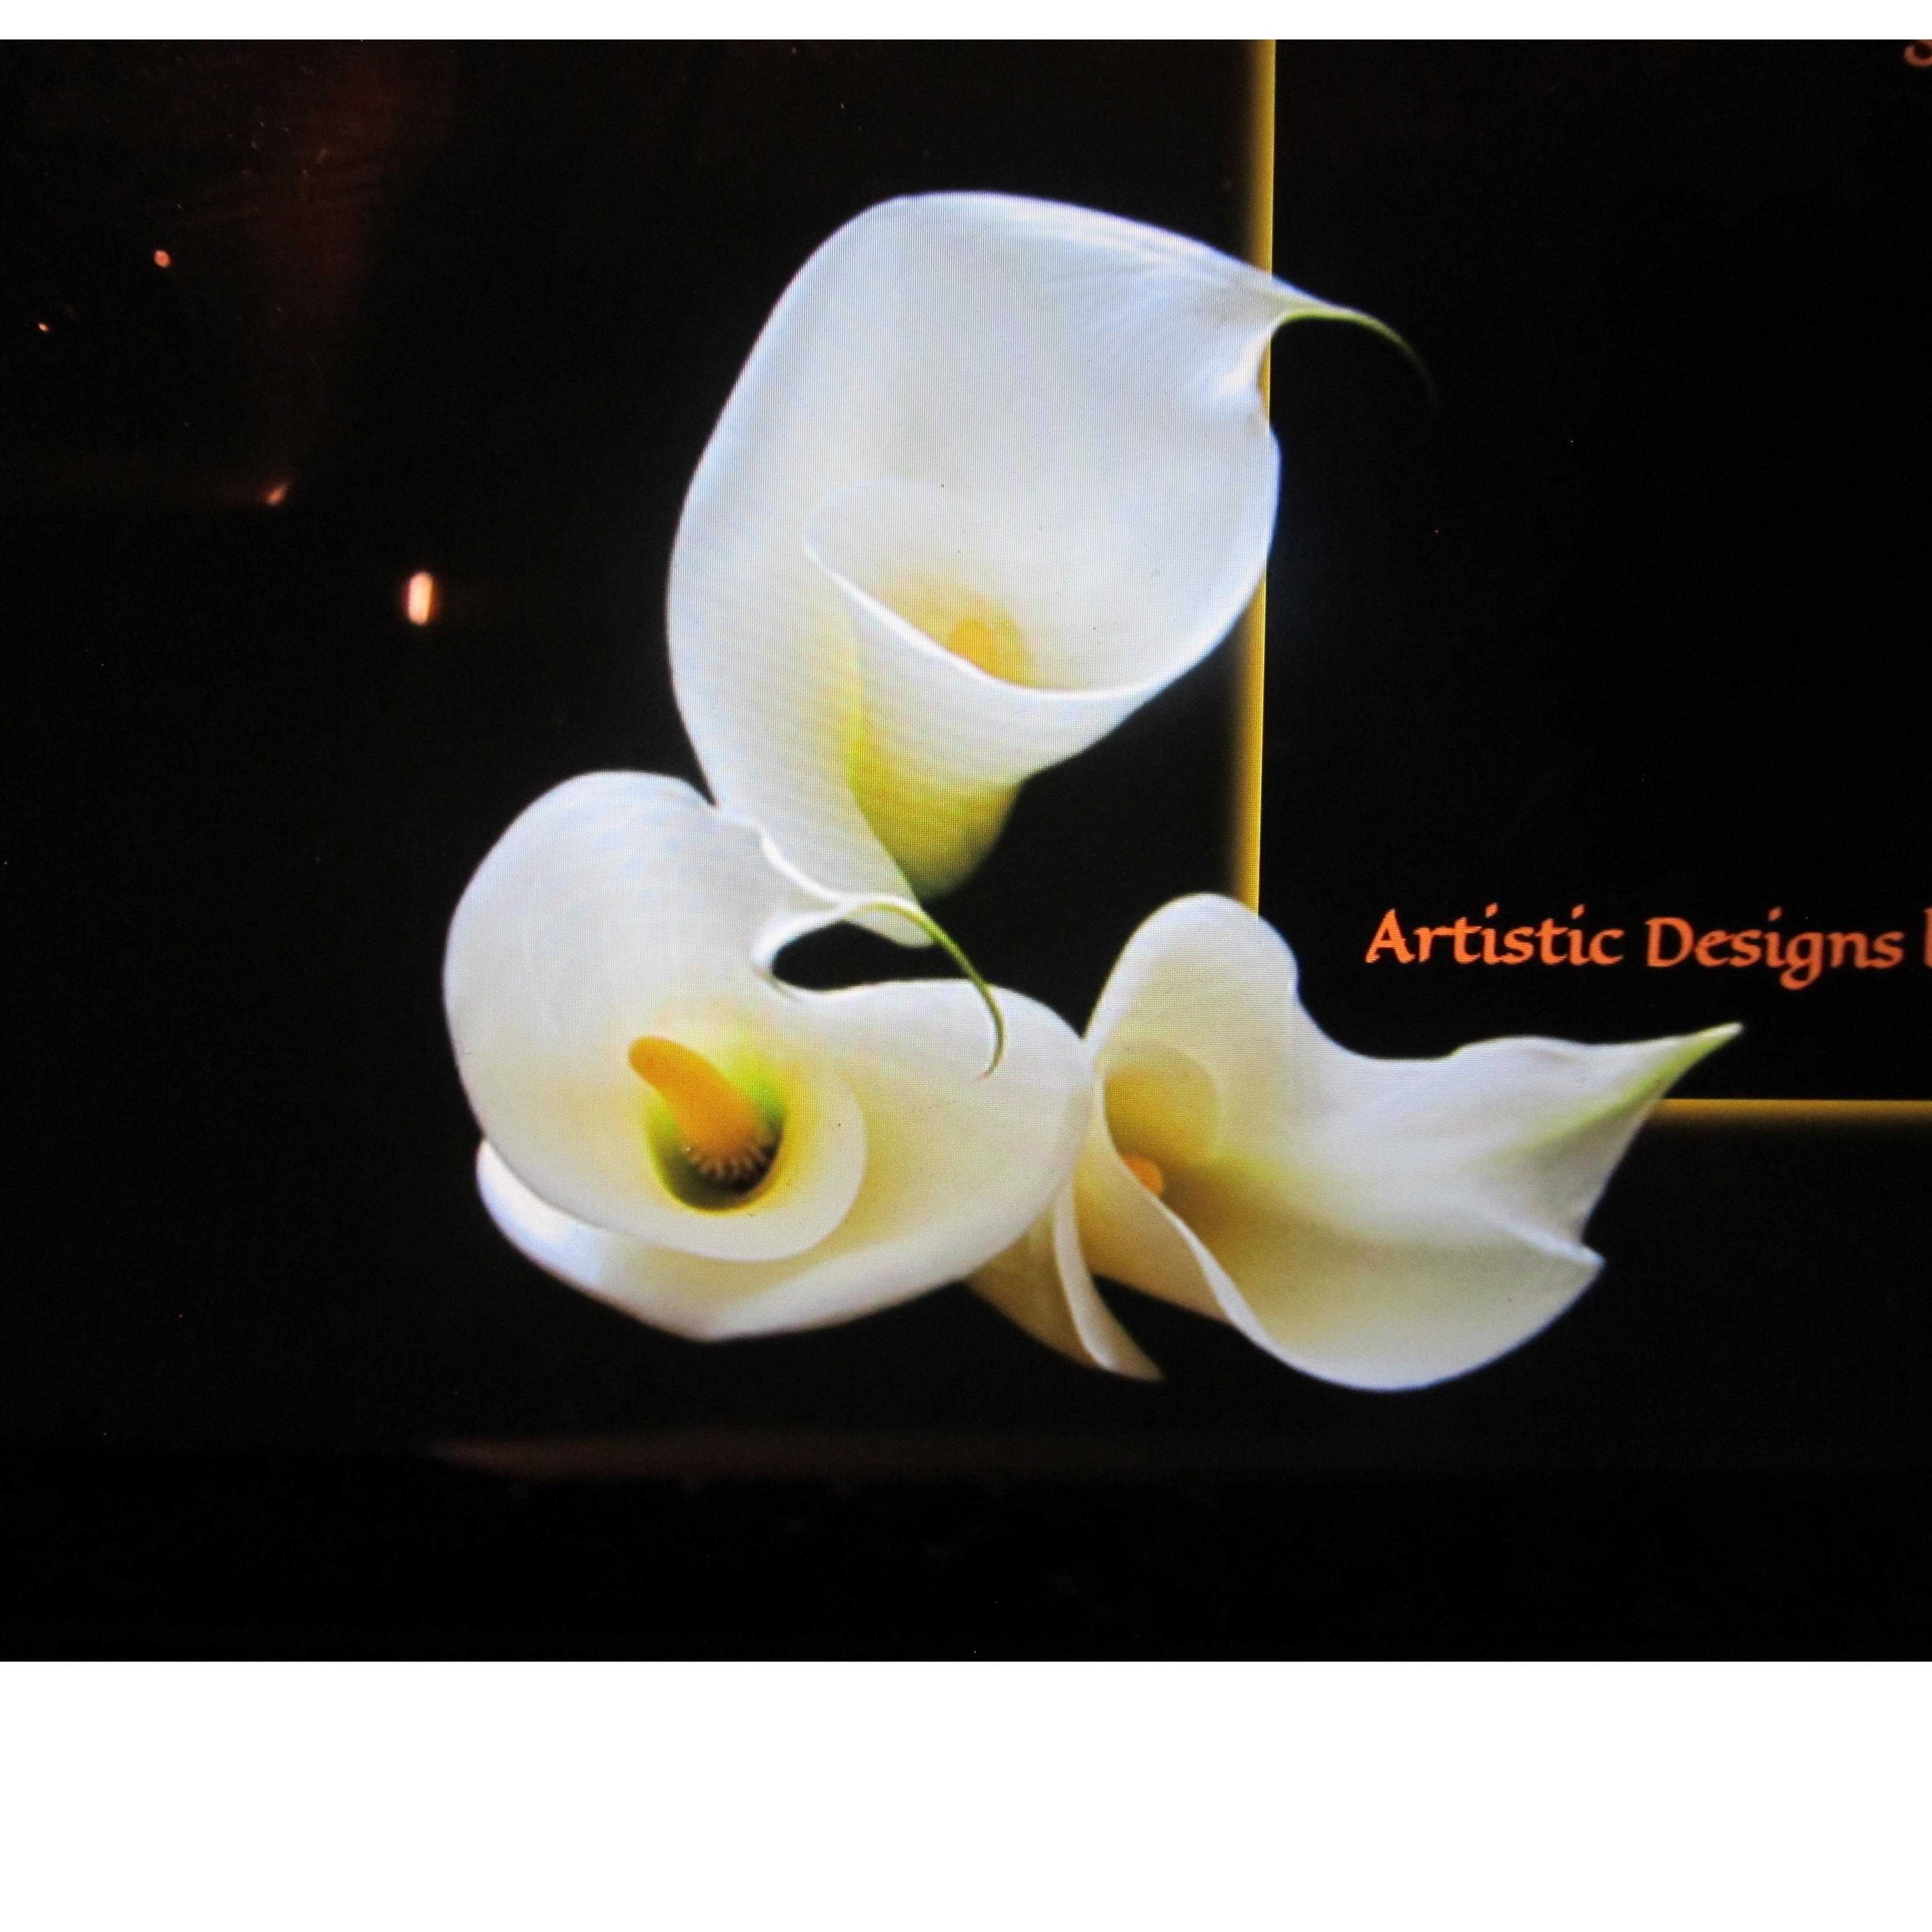 Artistic Designs by Brenda - Ocean Shores, WA 98569 - (360)214-4974 | ShowMeLocal.com